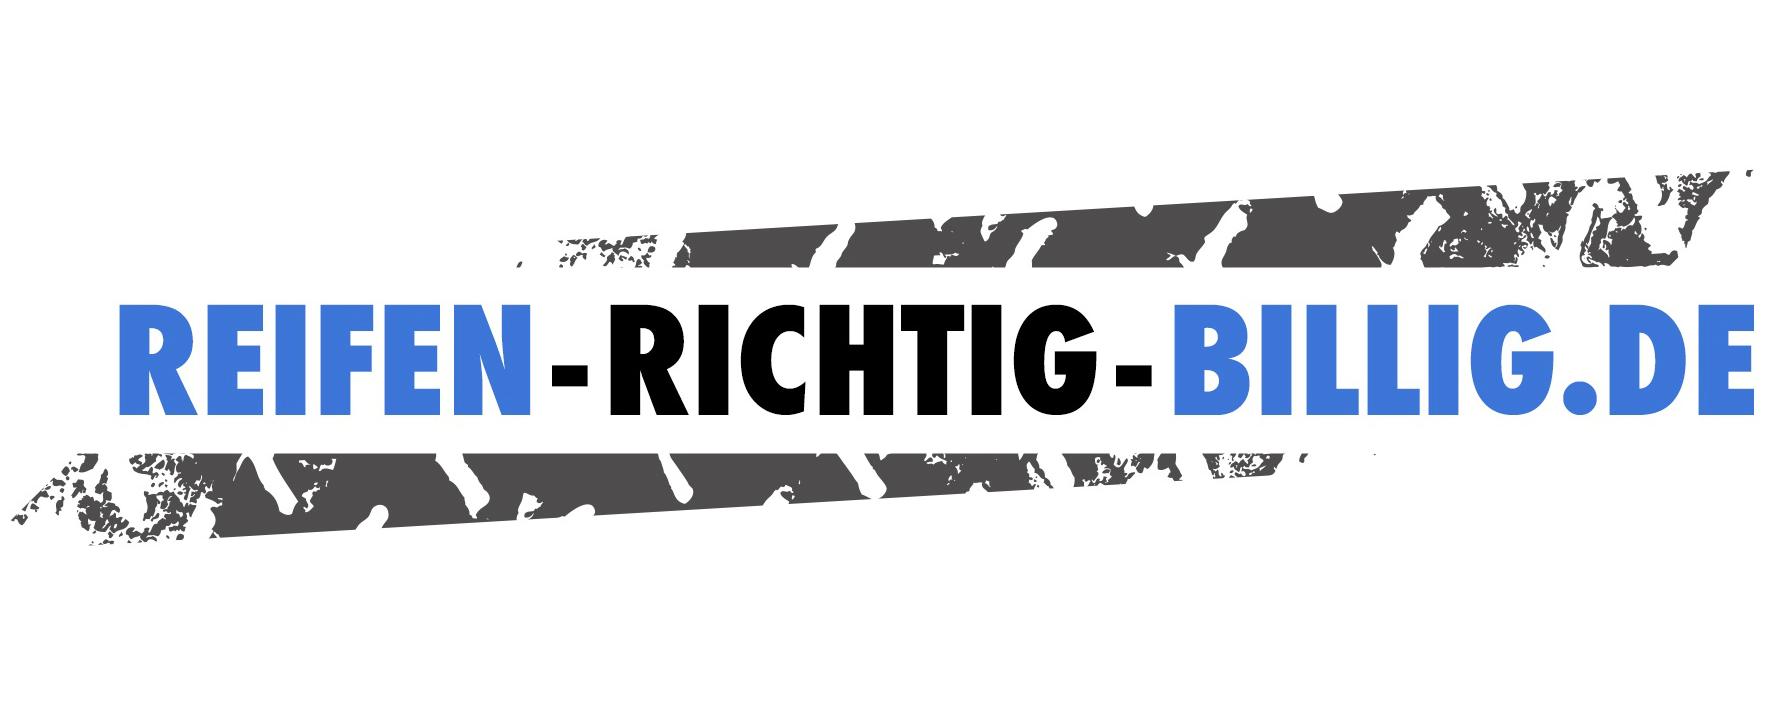 reifen-richtig-billig.de Logo